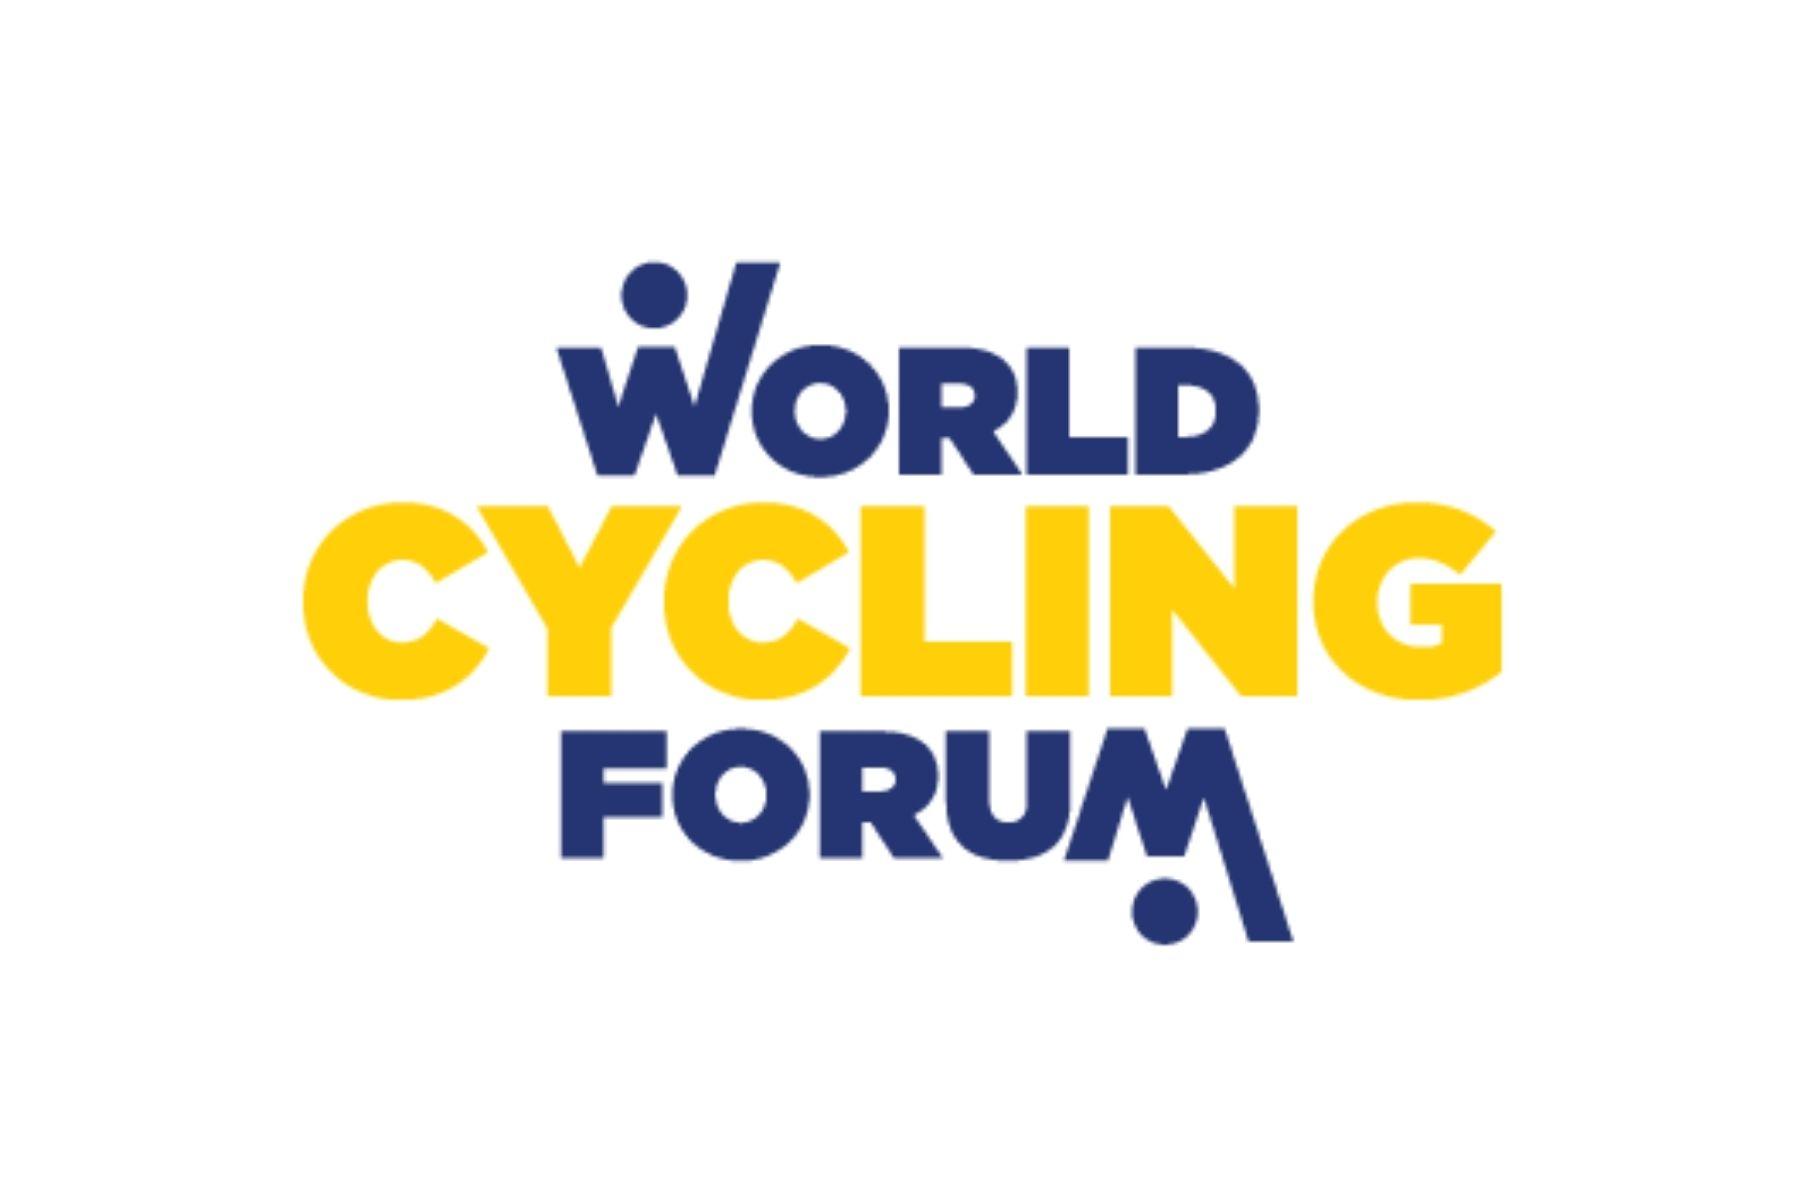 Anmeldung jetzt geöffnet: 2021 WORLD CYCLING FORUM